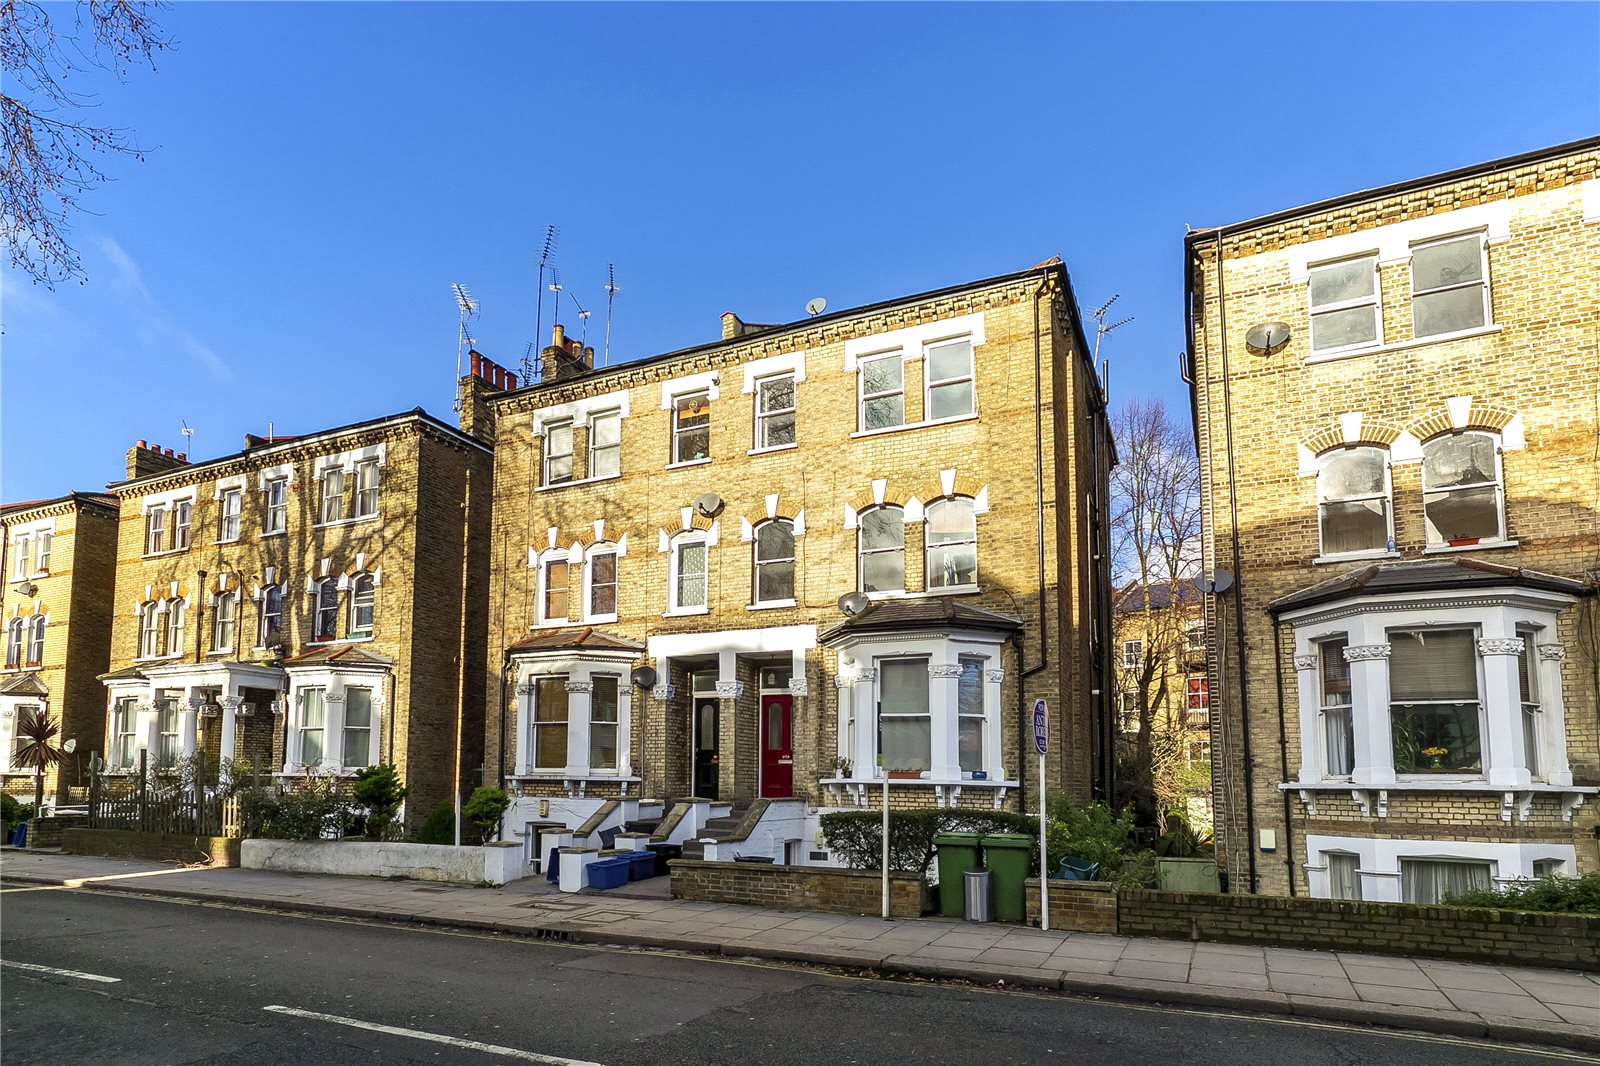 Richmond Road, East Twickenham, TW1 2PB - Antony Roberts